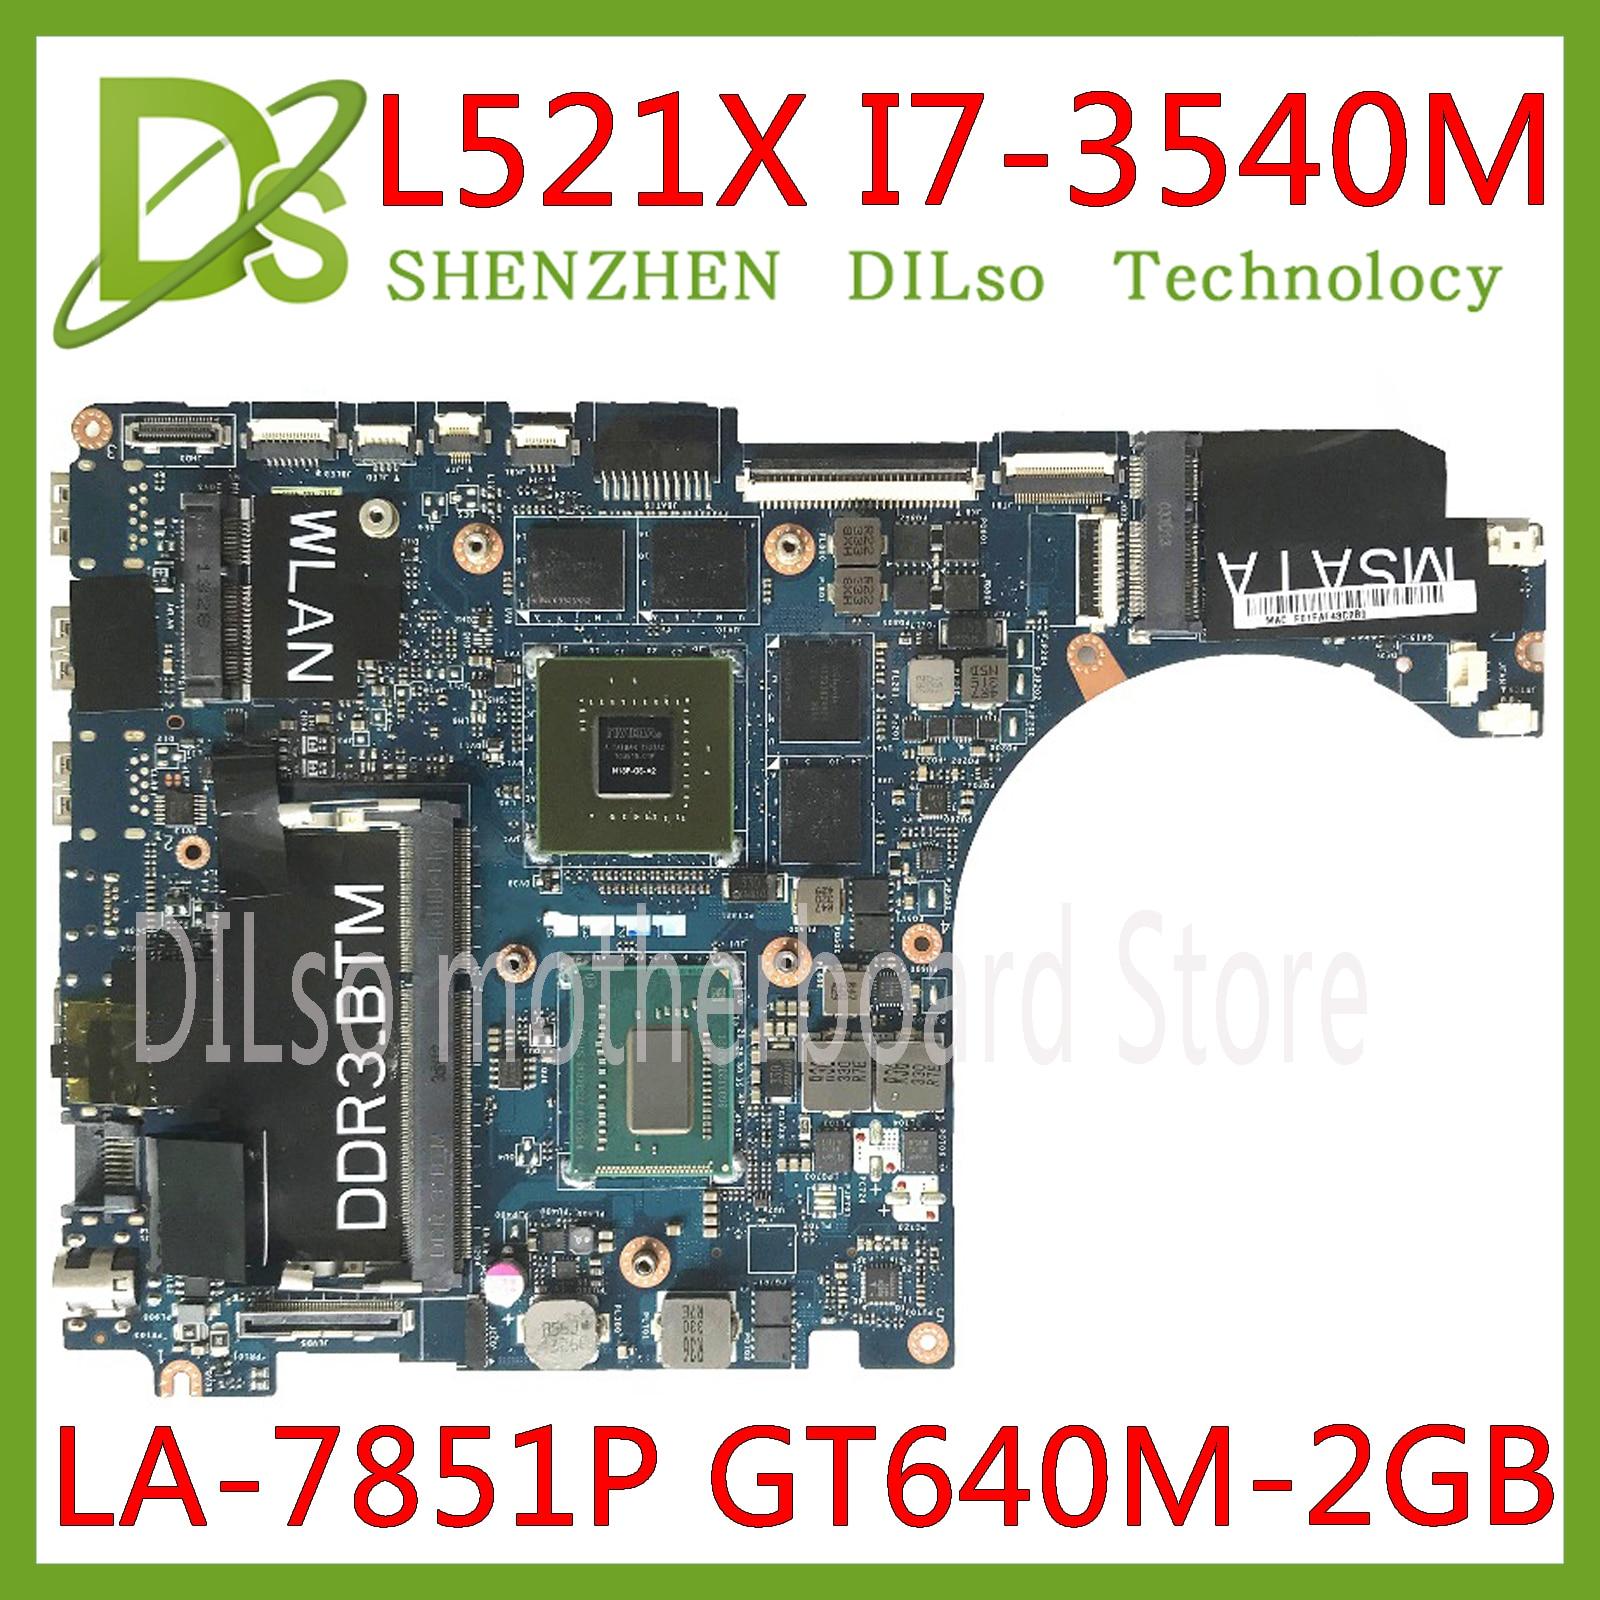 KEFU QBL00 LA-7851P اللوحة الأم لأجهزة الكمبيوتر المحمول ديل XPS 15 L521X I7-3540M DDR3L GT640M 2GB اختبار كامل 100% العمل